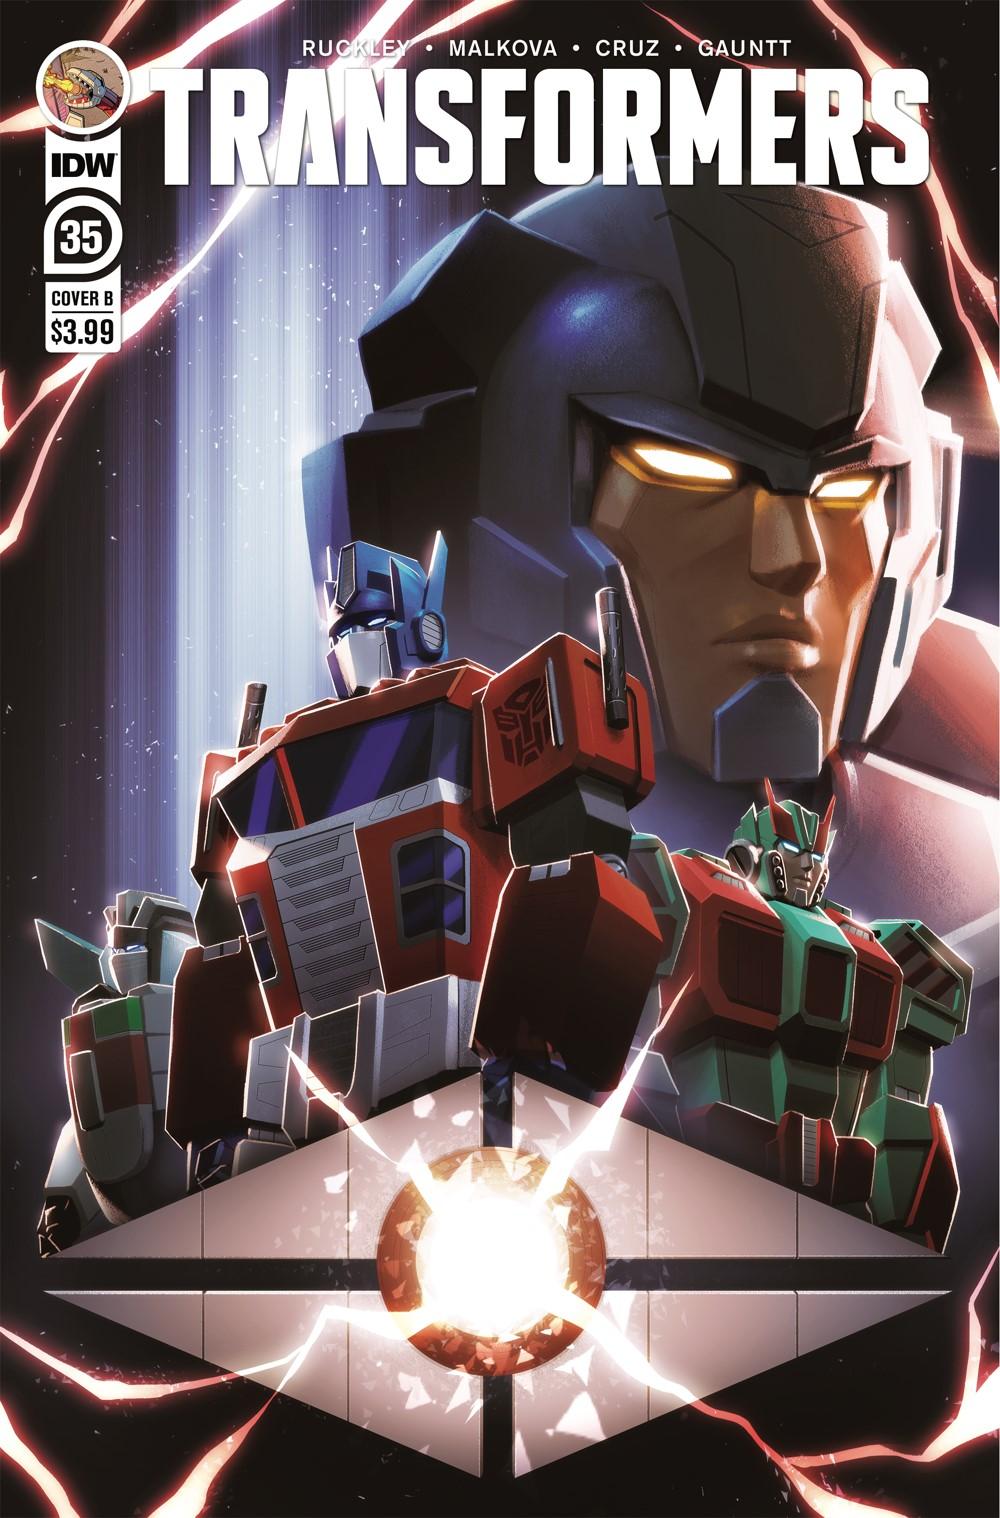 TF35-cvr-B ComicList Previews: TRANSFORMERS #35